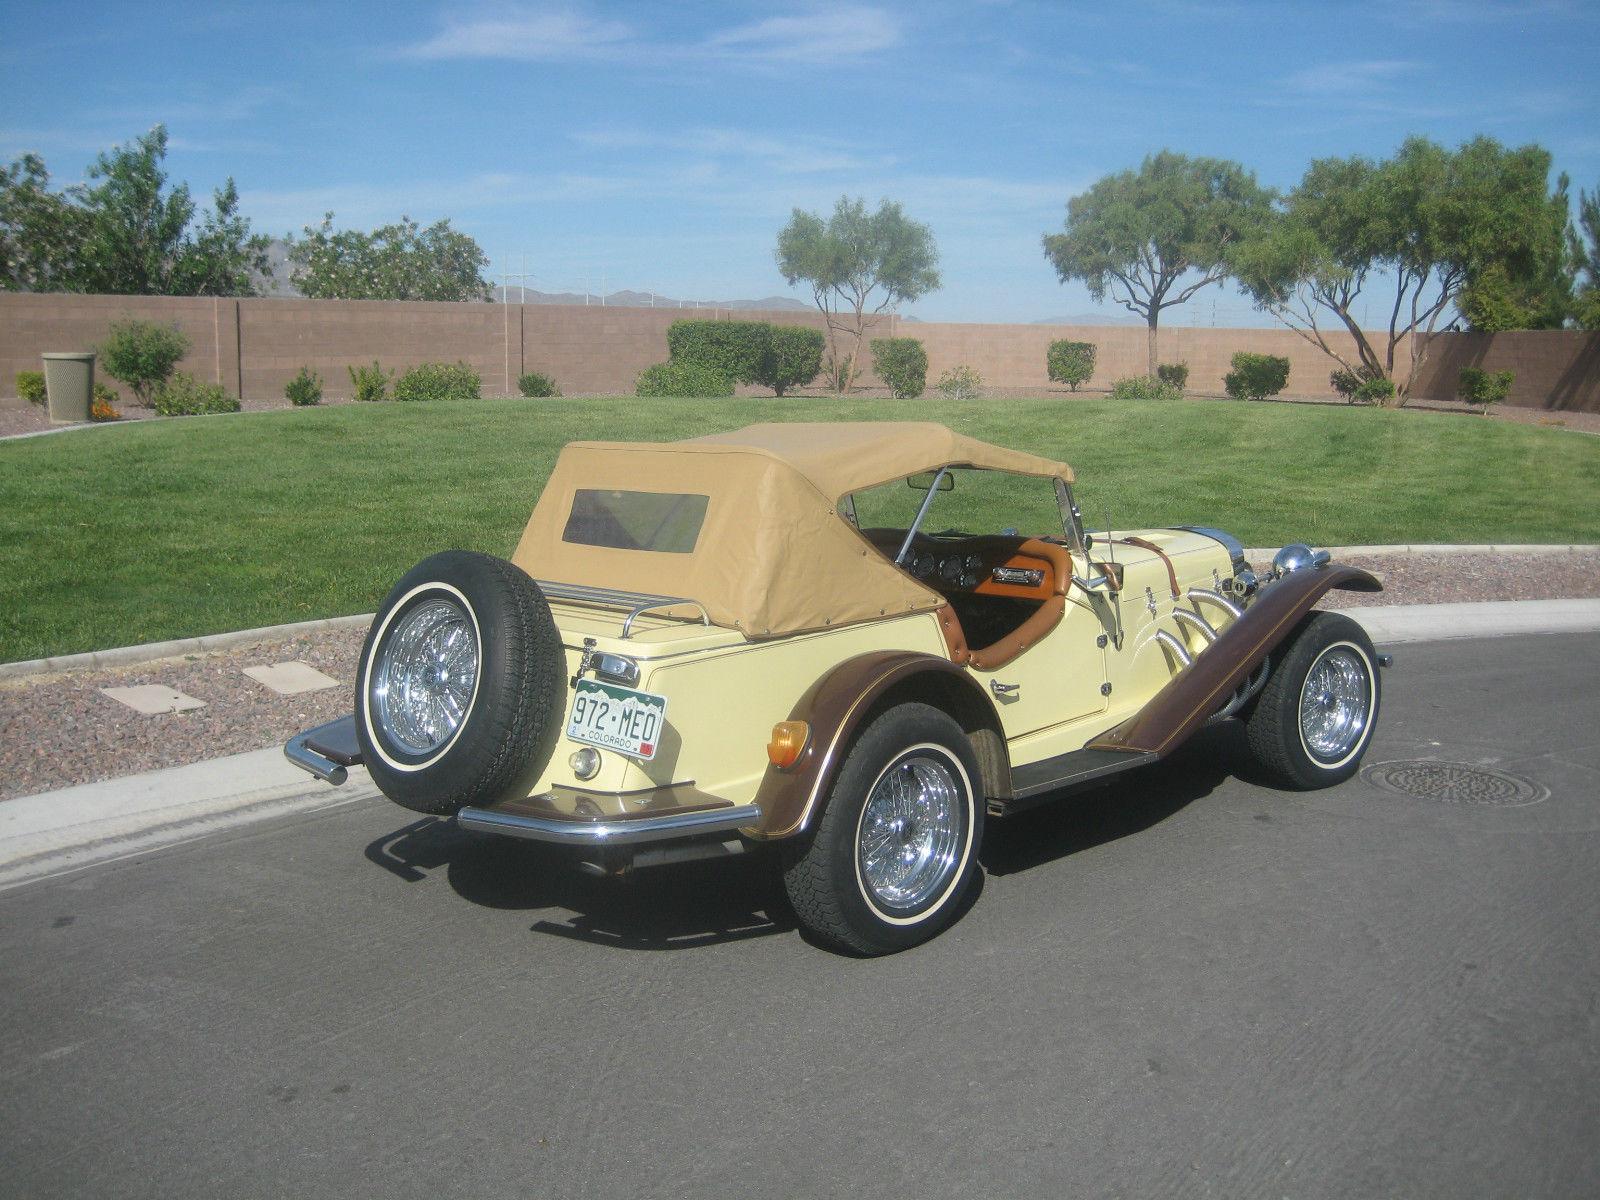 1929 MERCEDES GAZELLE ROADSTER -- REPLICA/KIT CAR*****